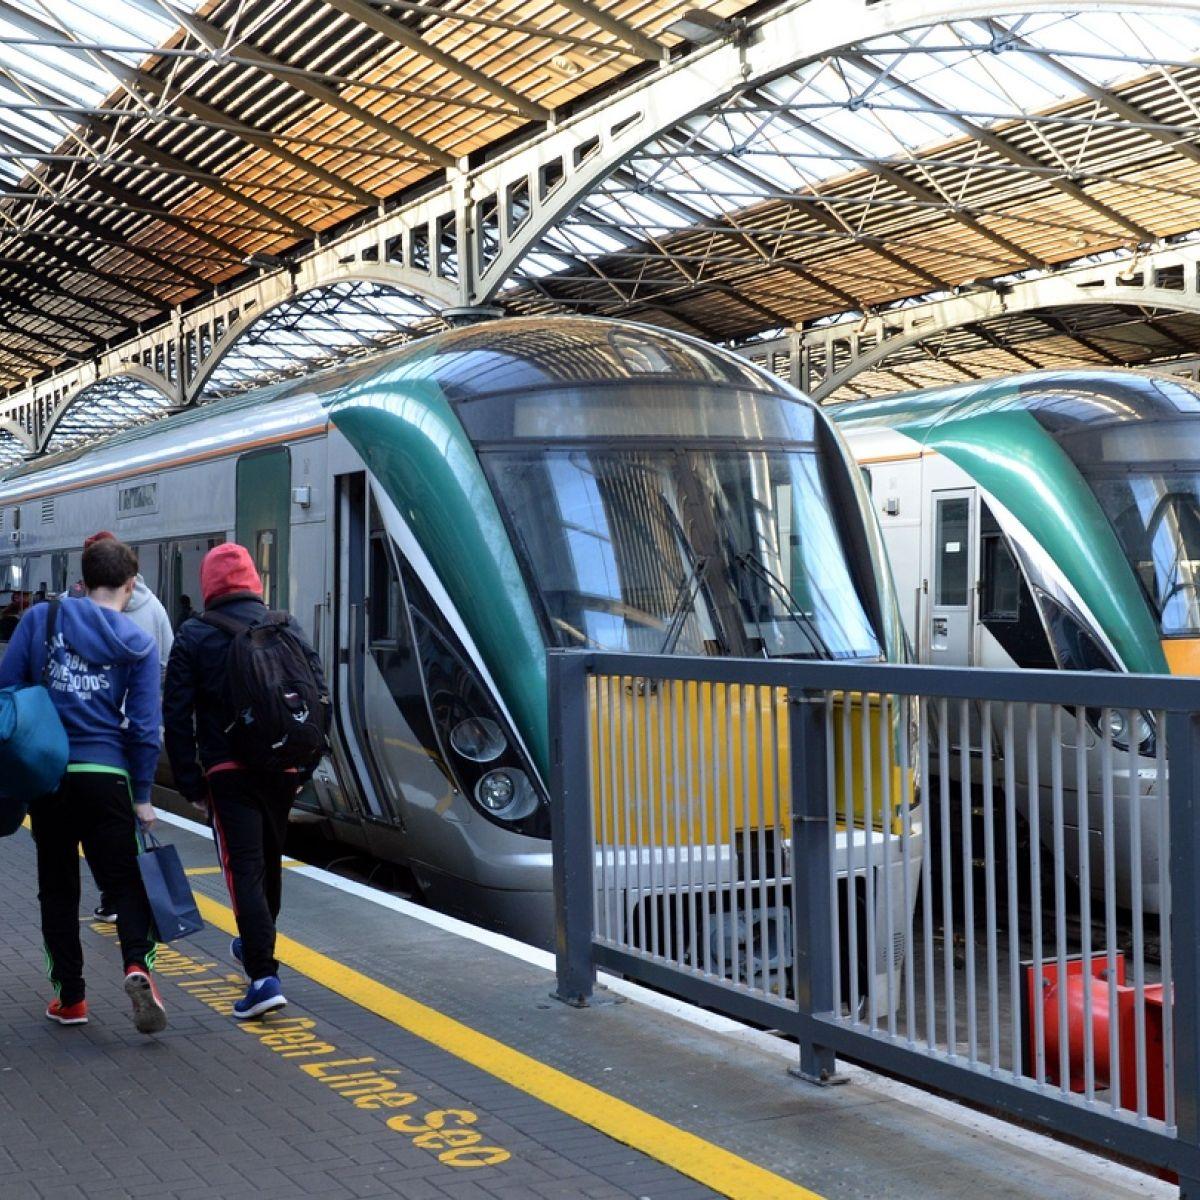 Maynooth, Co. Kildare - Irish Rail